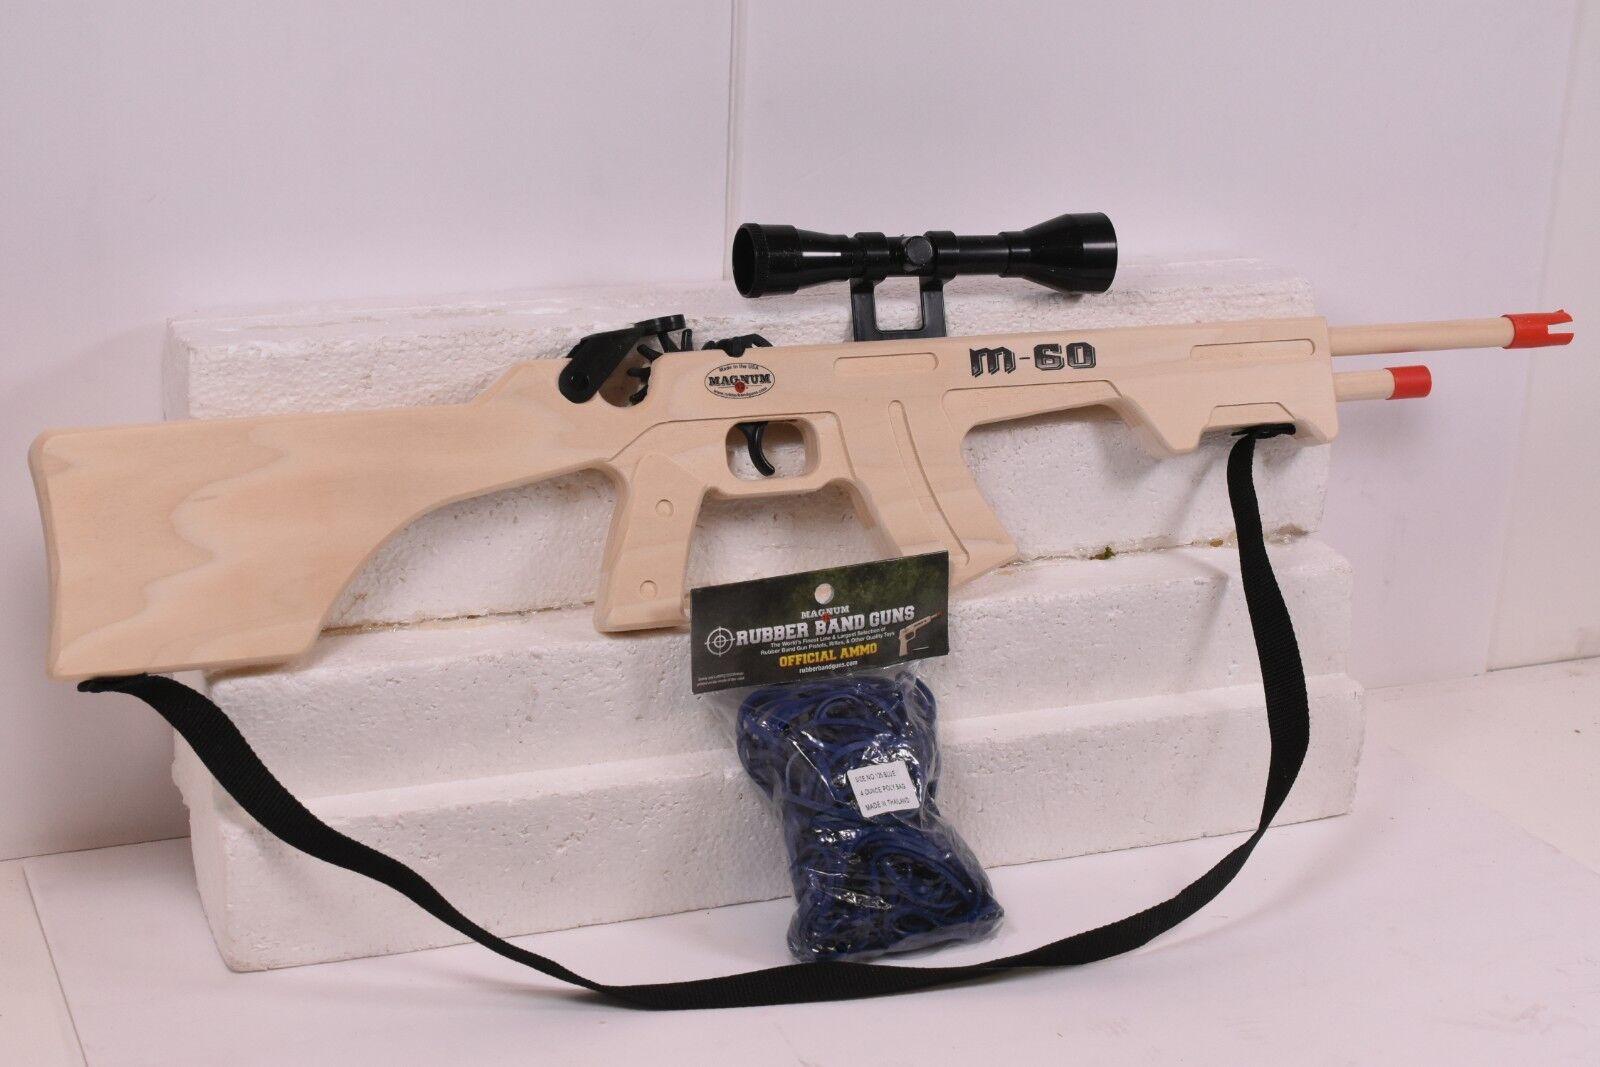 MAGNUM RUBBER RUBBER RUBBER BAND GUNS M-60 W  SCOPE & SLING  GL2M60SS  PLUS AMMO 4811e7